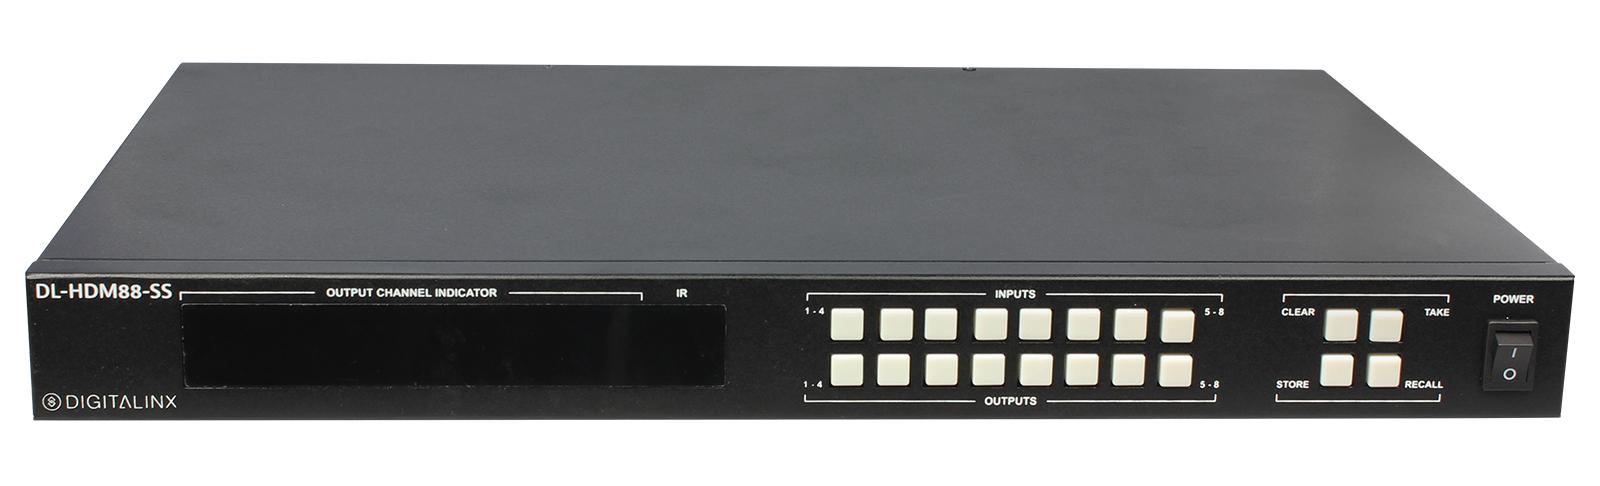 8x8 HDMI Matrix HDMI 2.0, 4K60 4:4:4, HDCP 2.2 Compliant